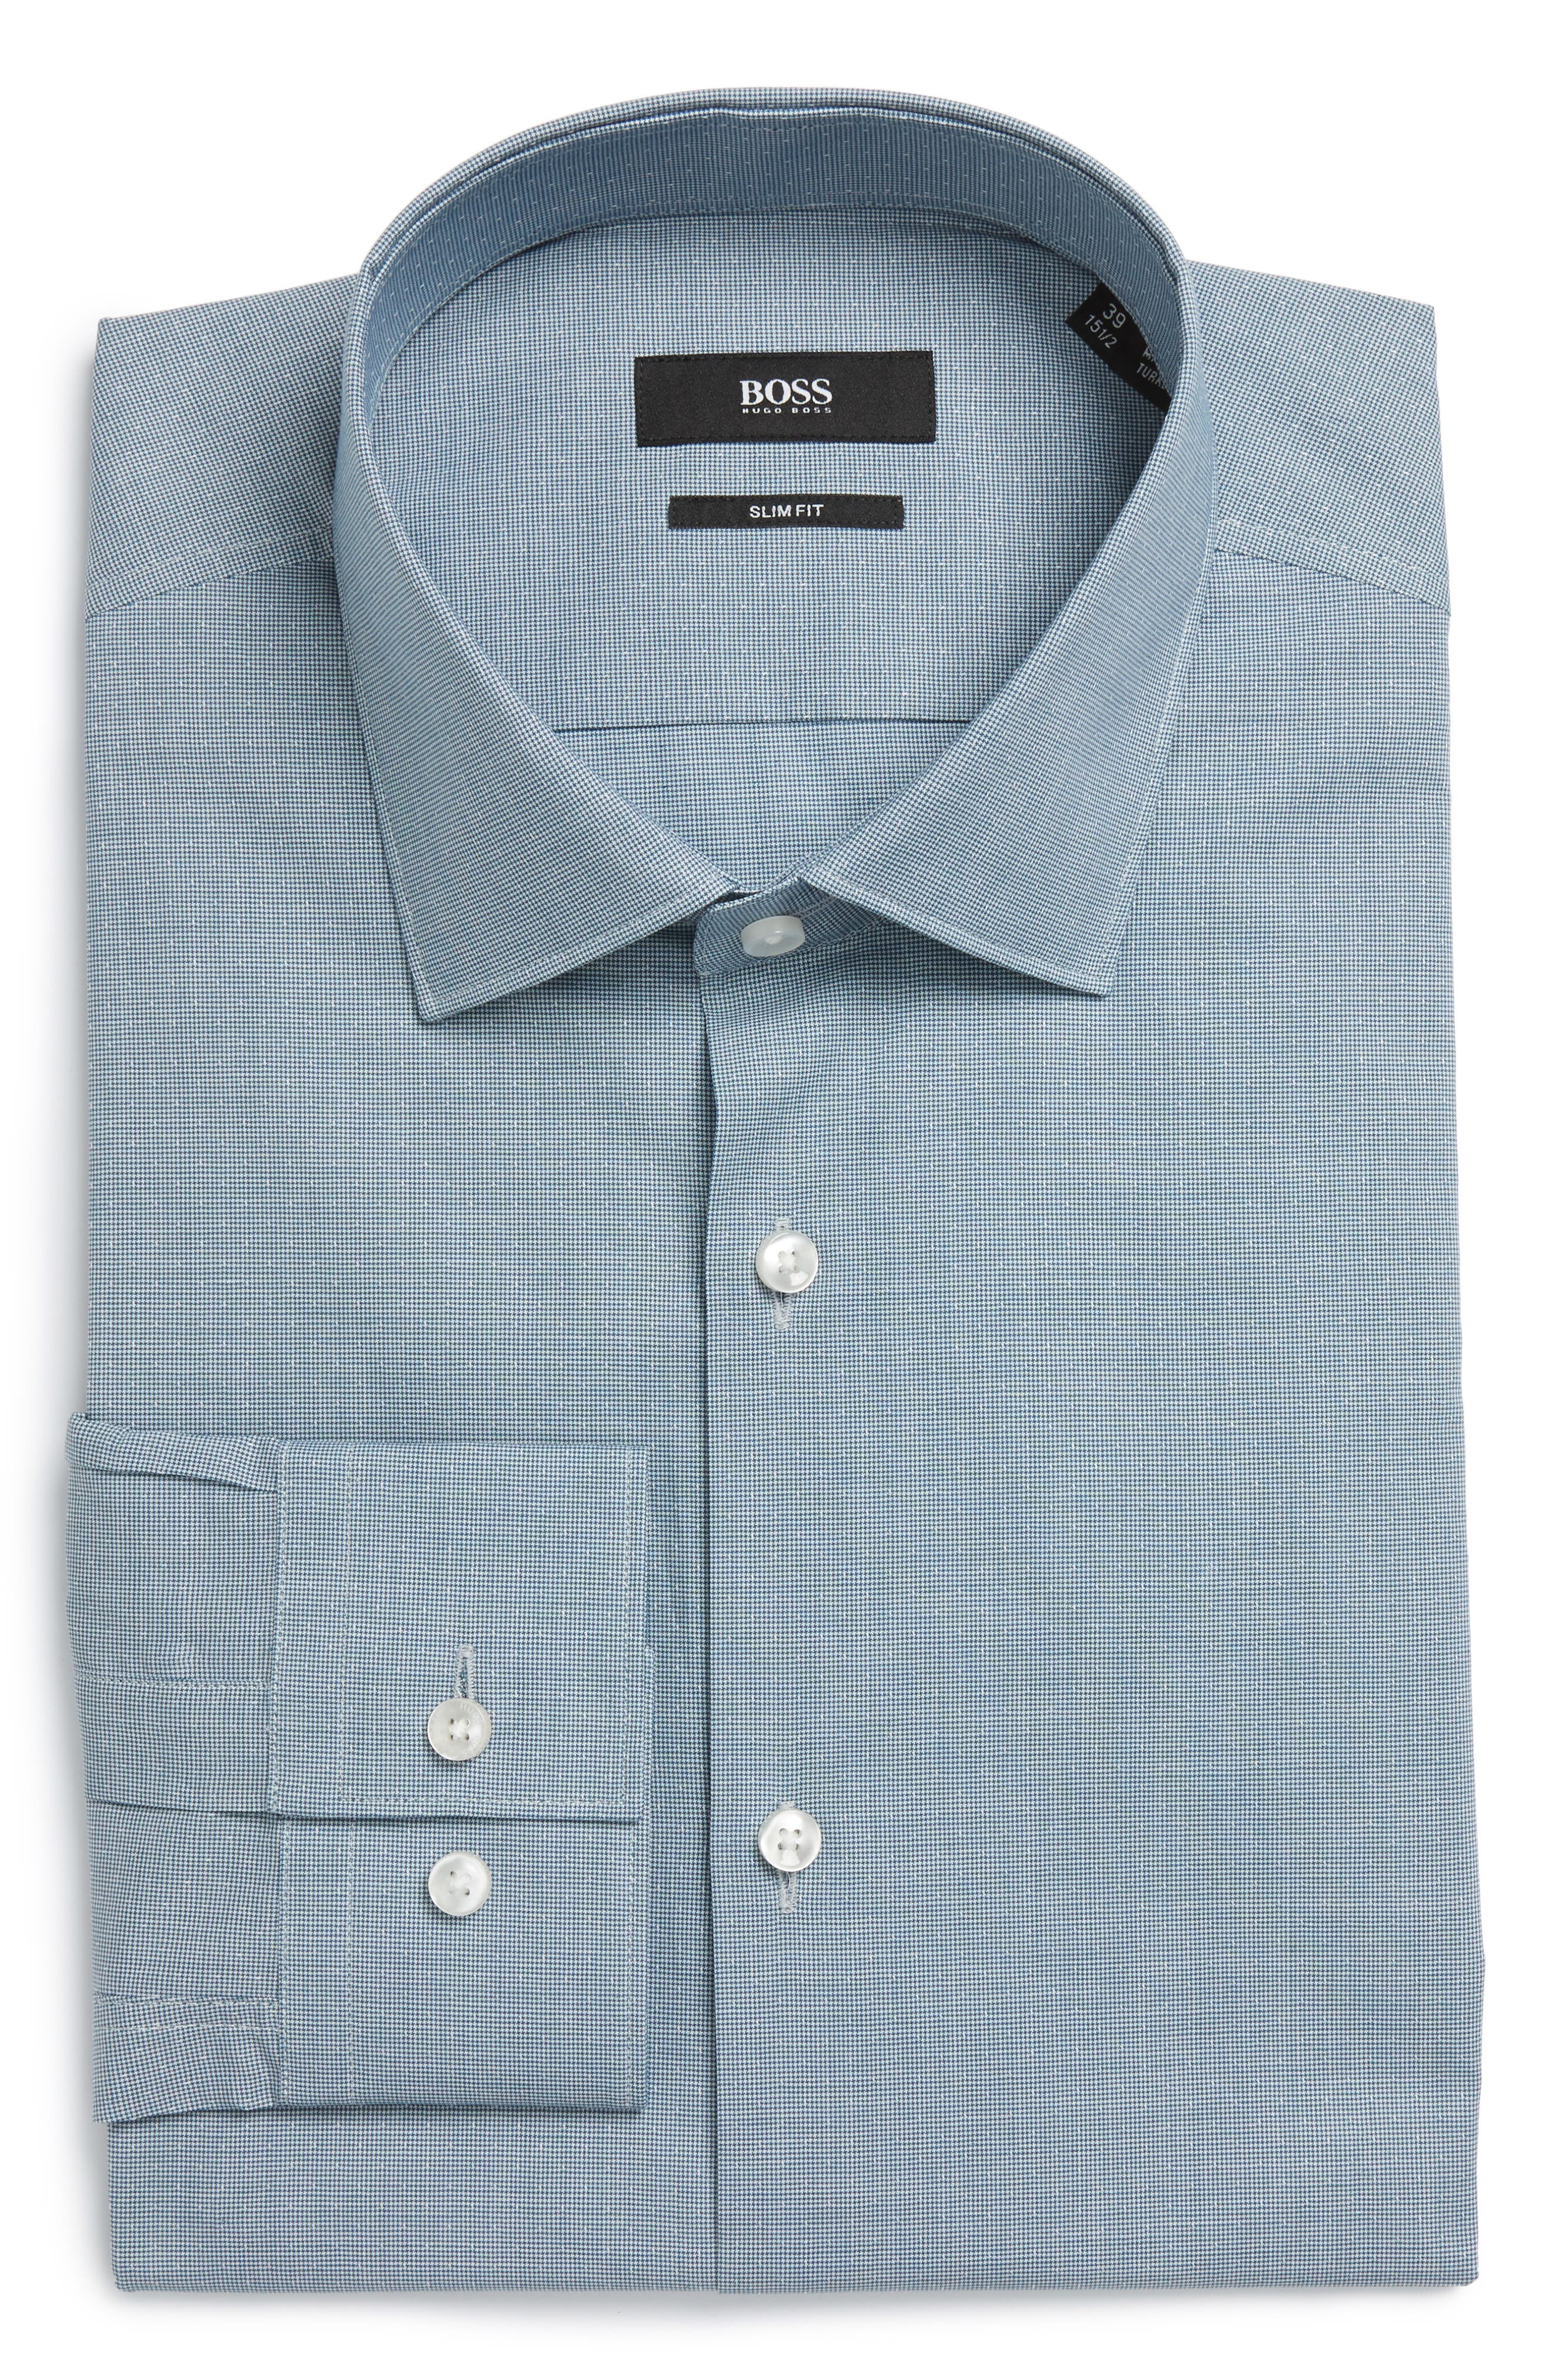 BOSS Ismo Slim Fit Solid Dress Shirt